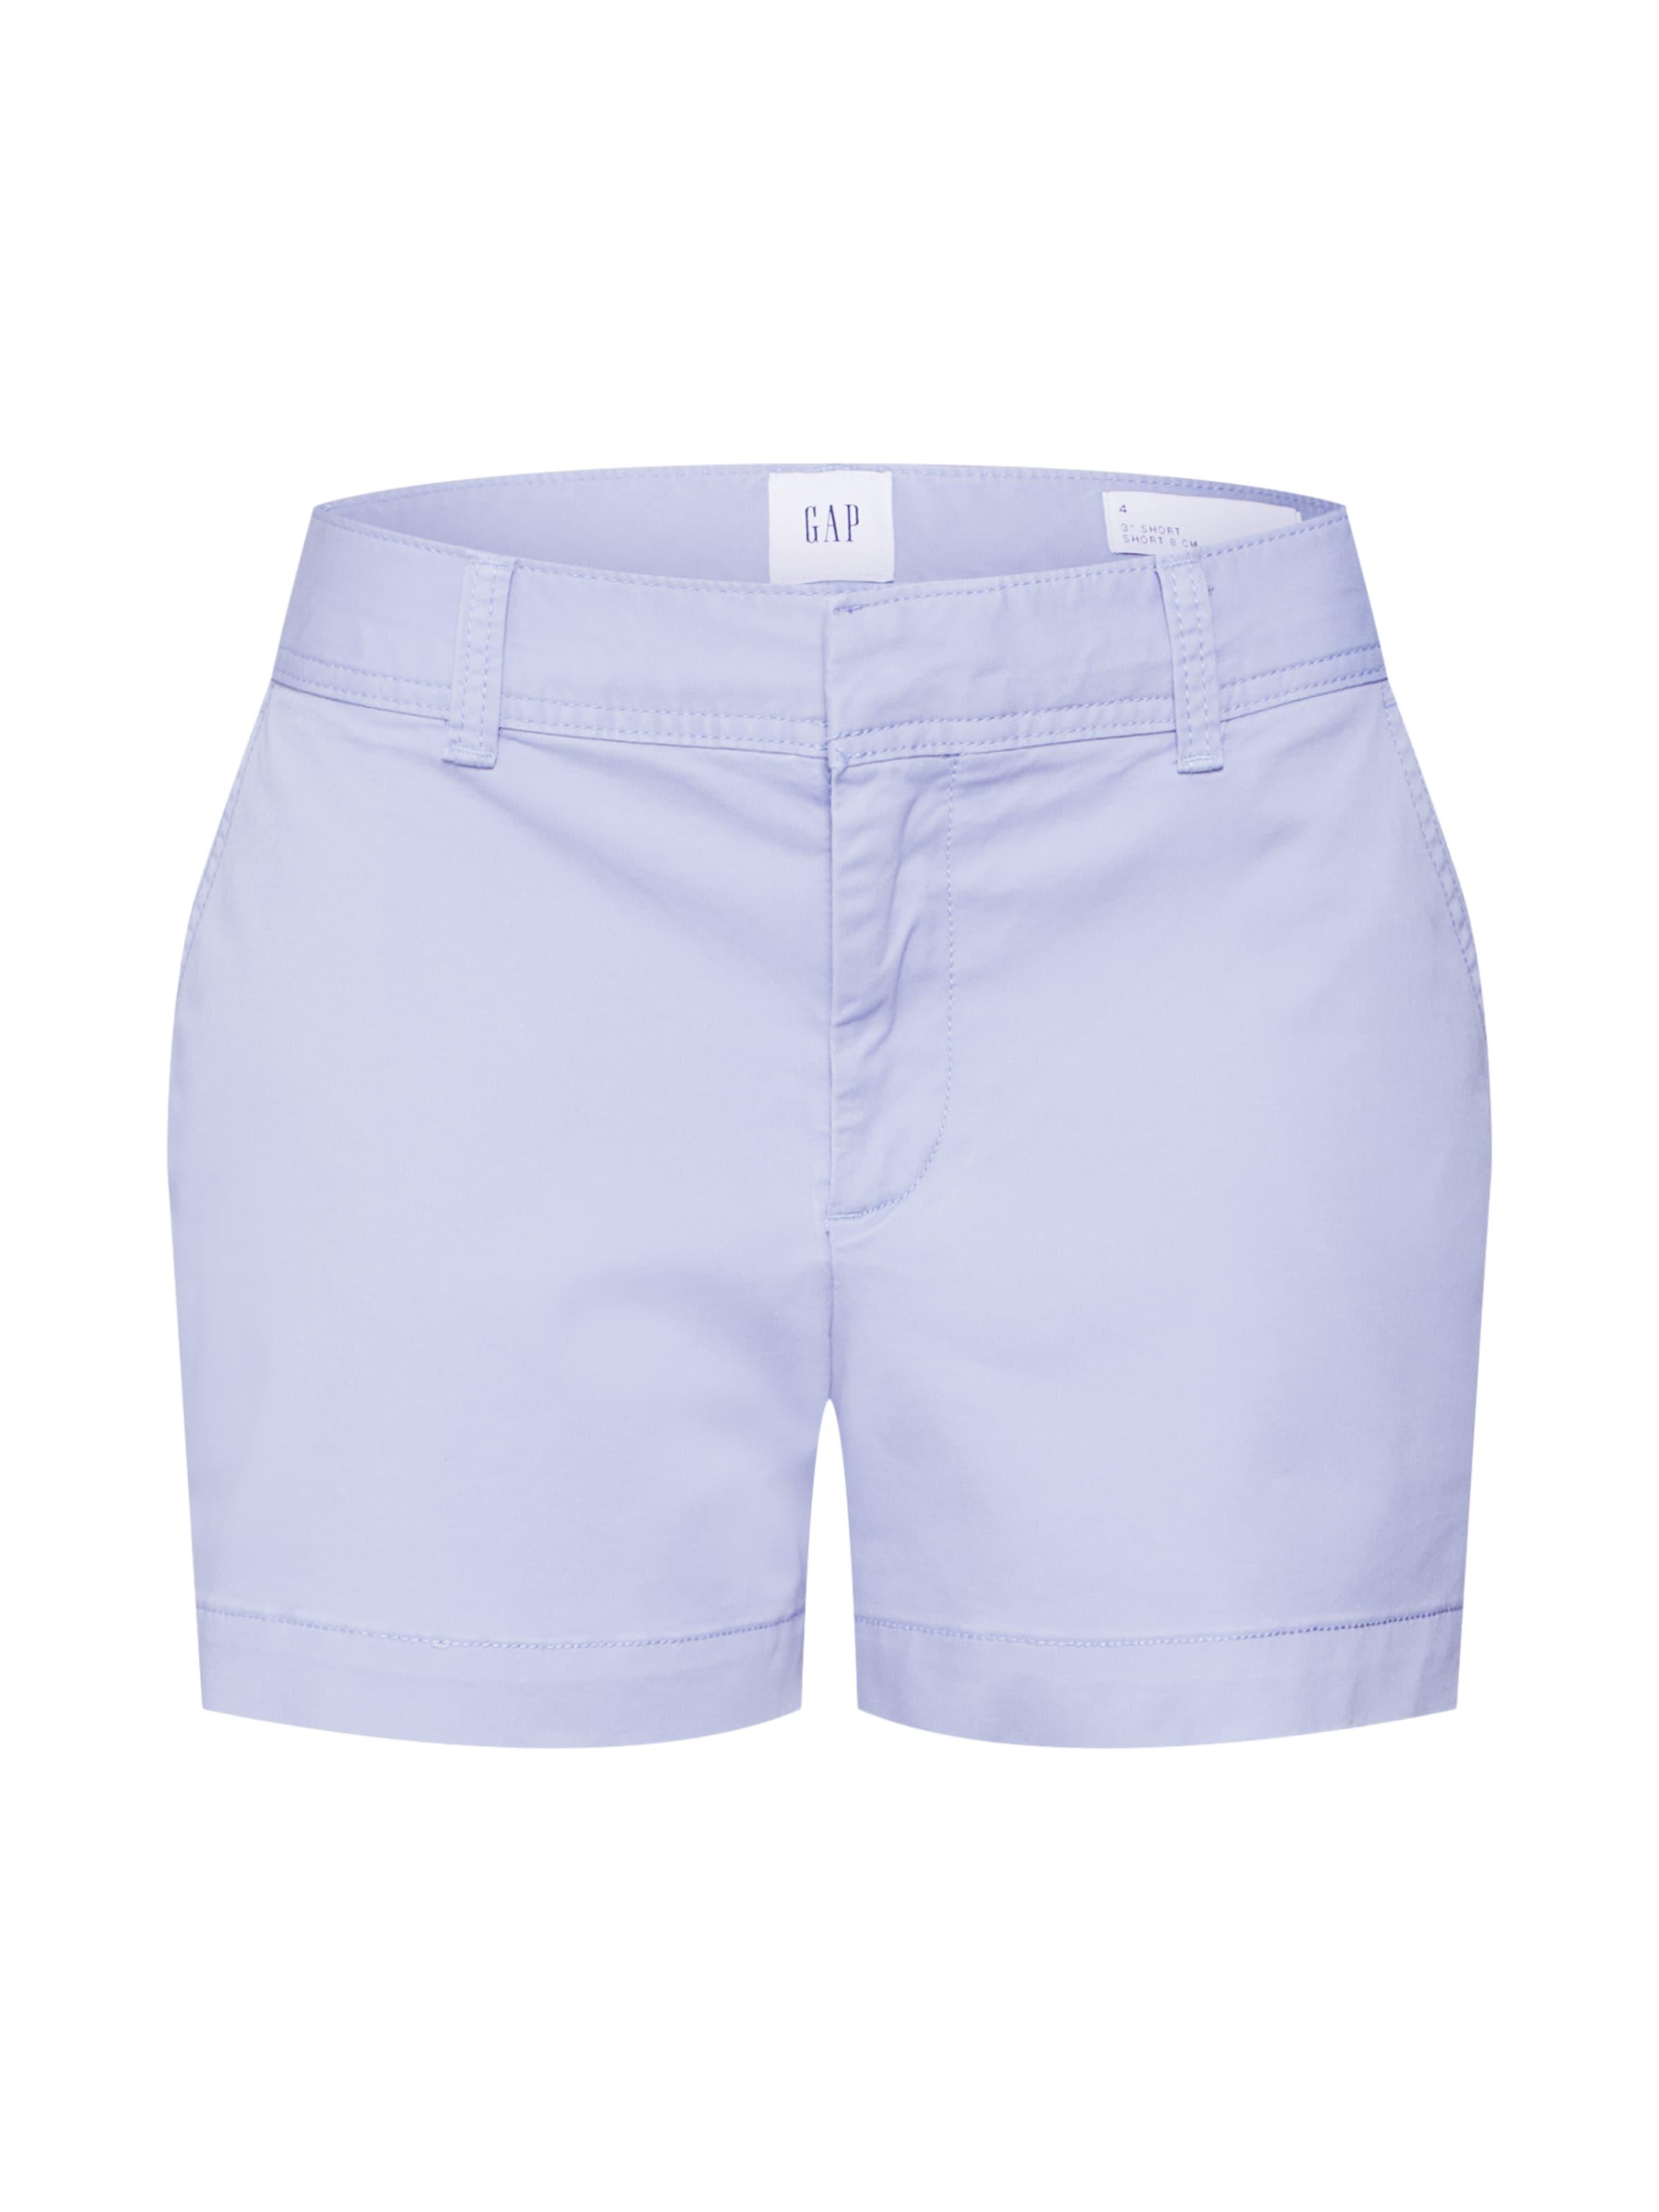 Pantalon Short En Embroidery' 'city Gap Bleu RLqj54A3